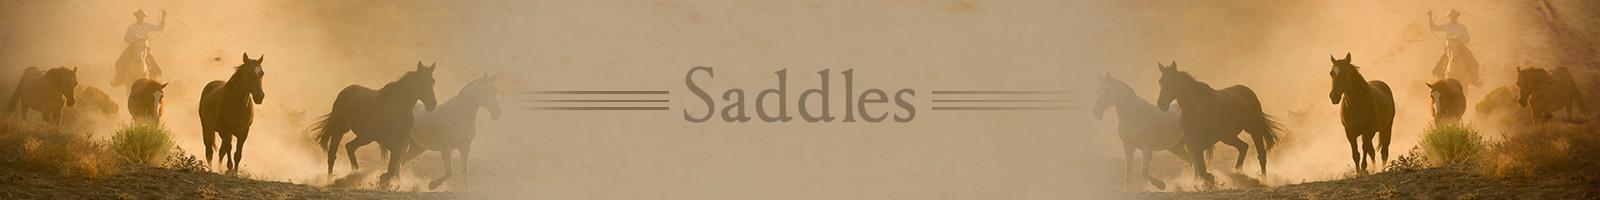 saddleshdr.png